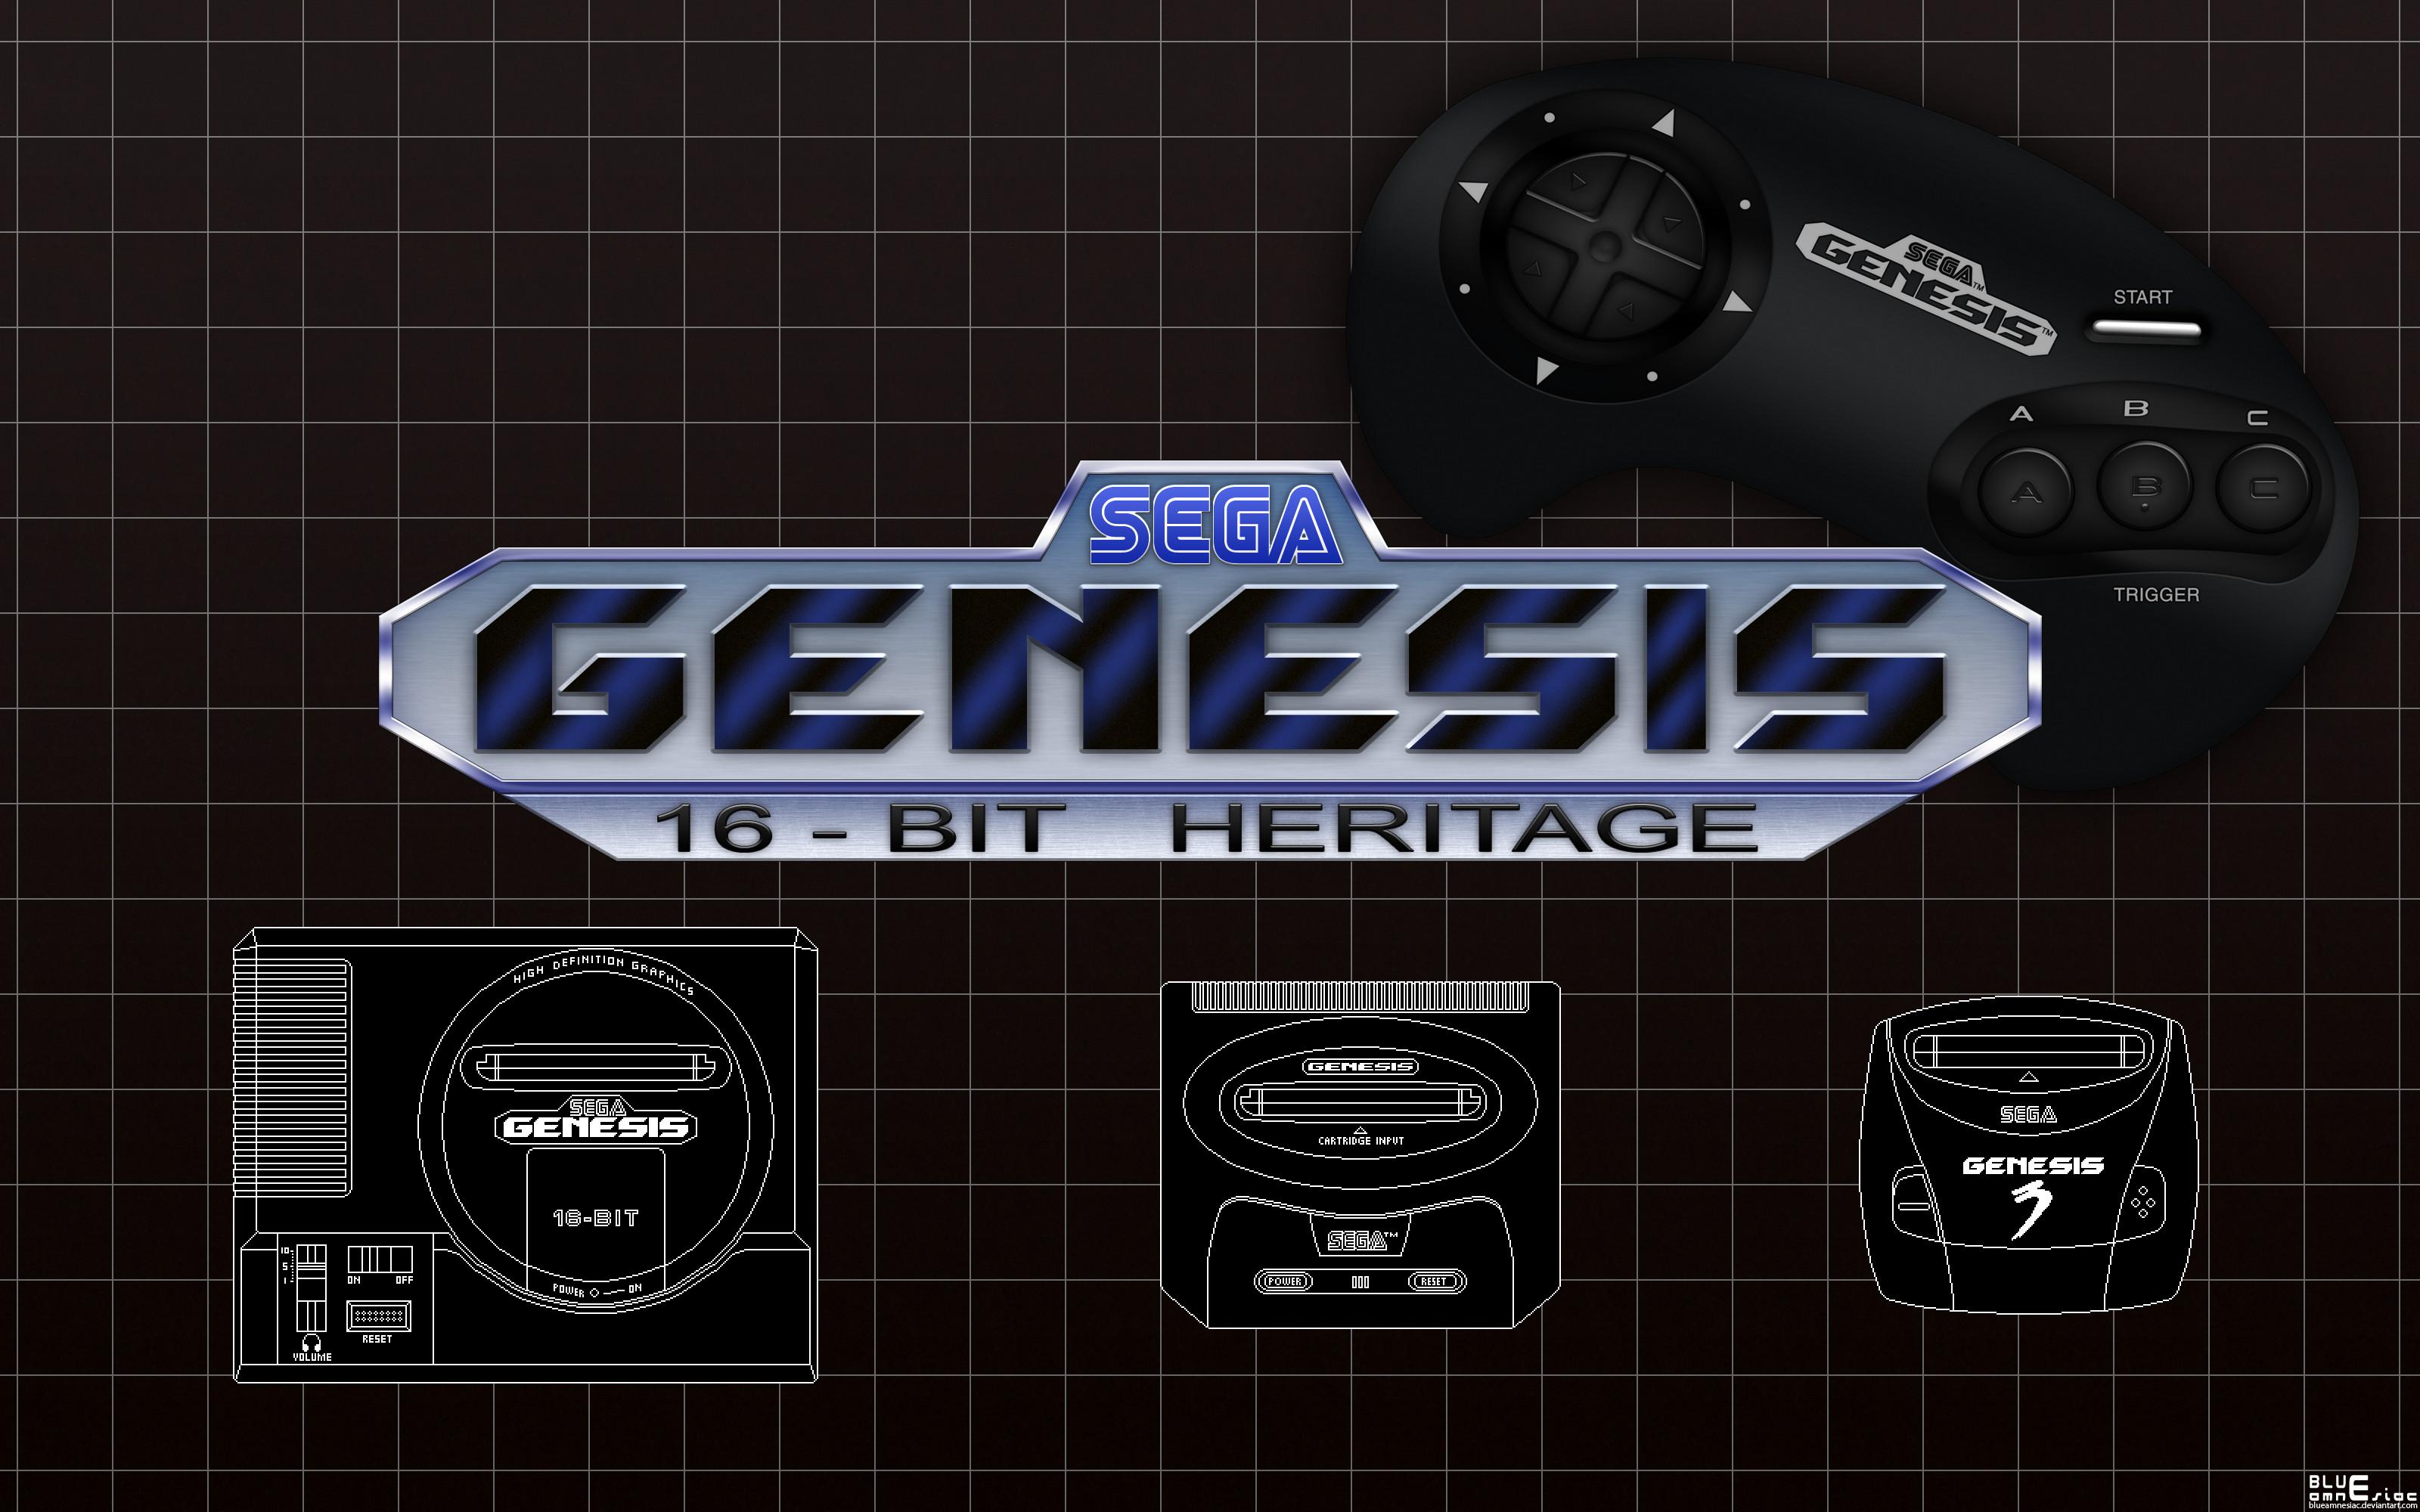 Sega Mega Drive: 16-bit Heritage Wallpaper by BLUEamnesiac on .